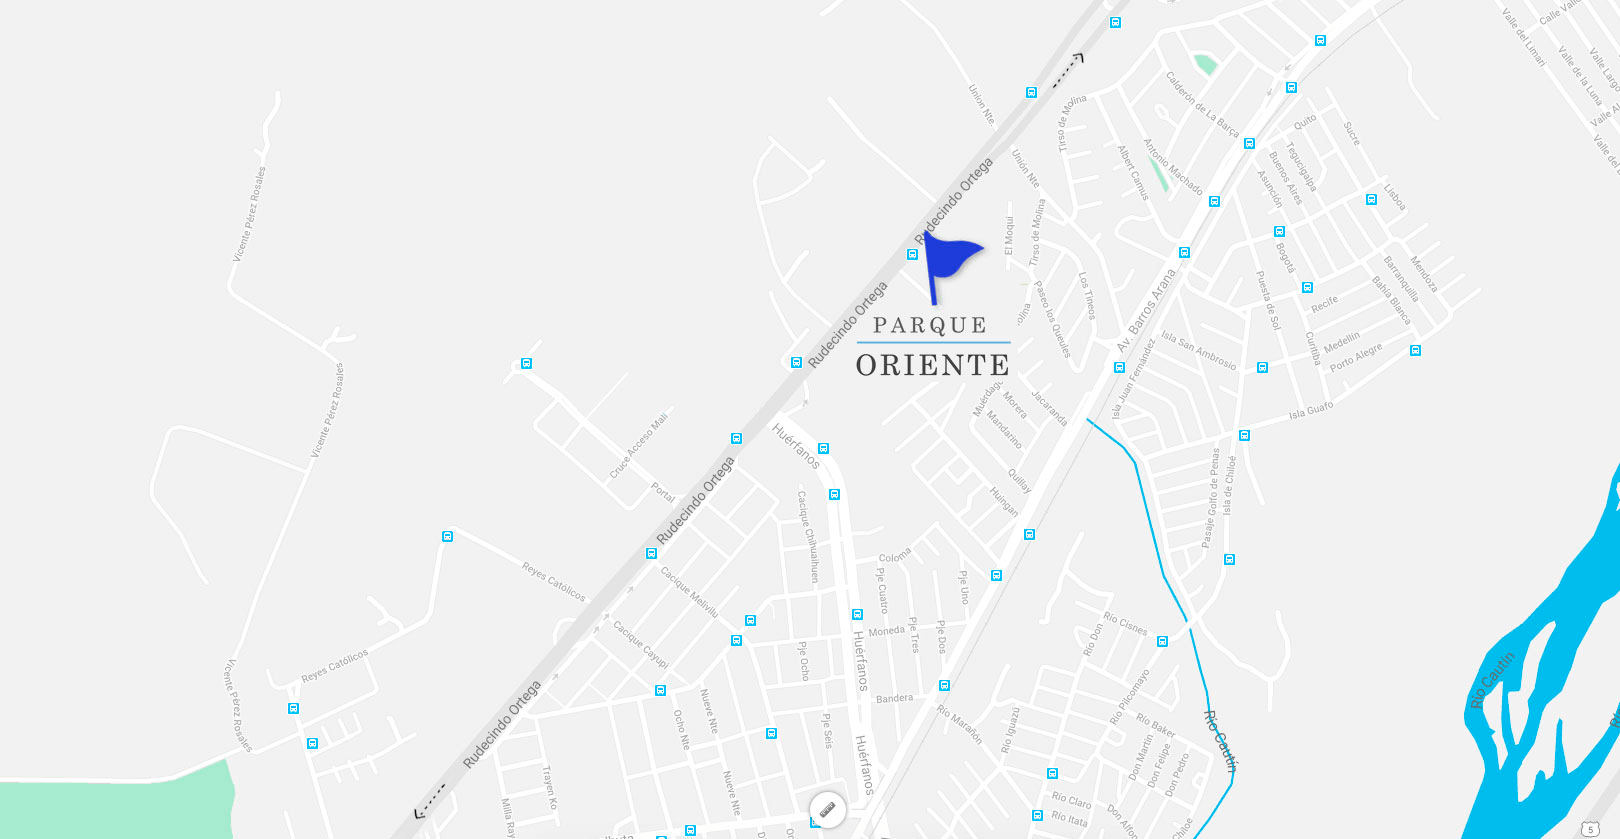 Condominio-Parque-Oriente-avance-Mapa